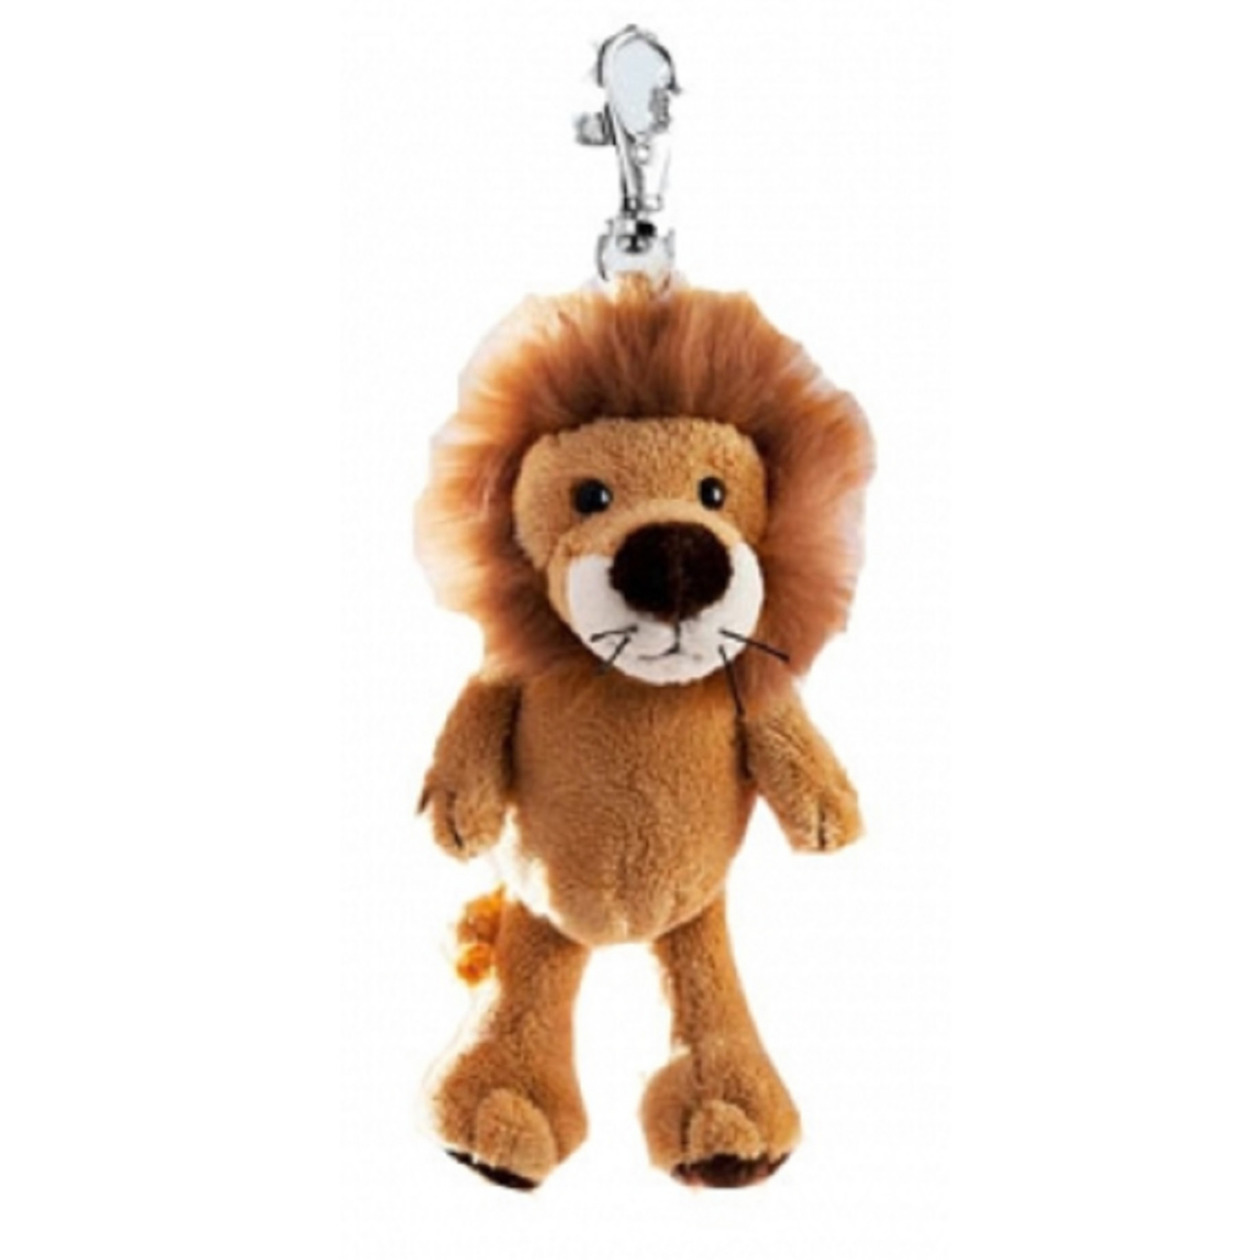 Leeuwen sleutelhanger 10 cm